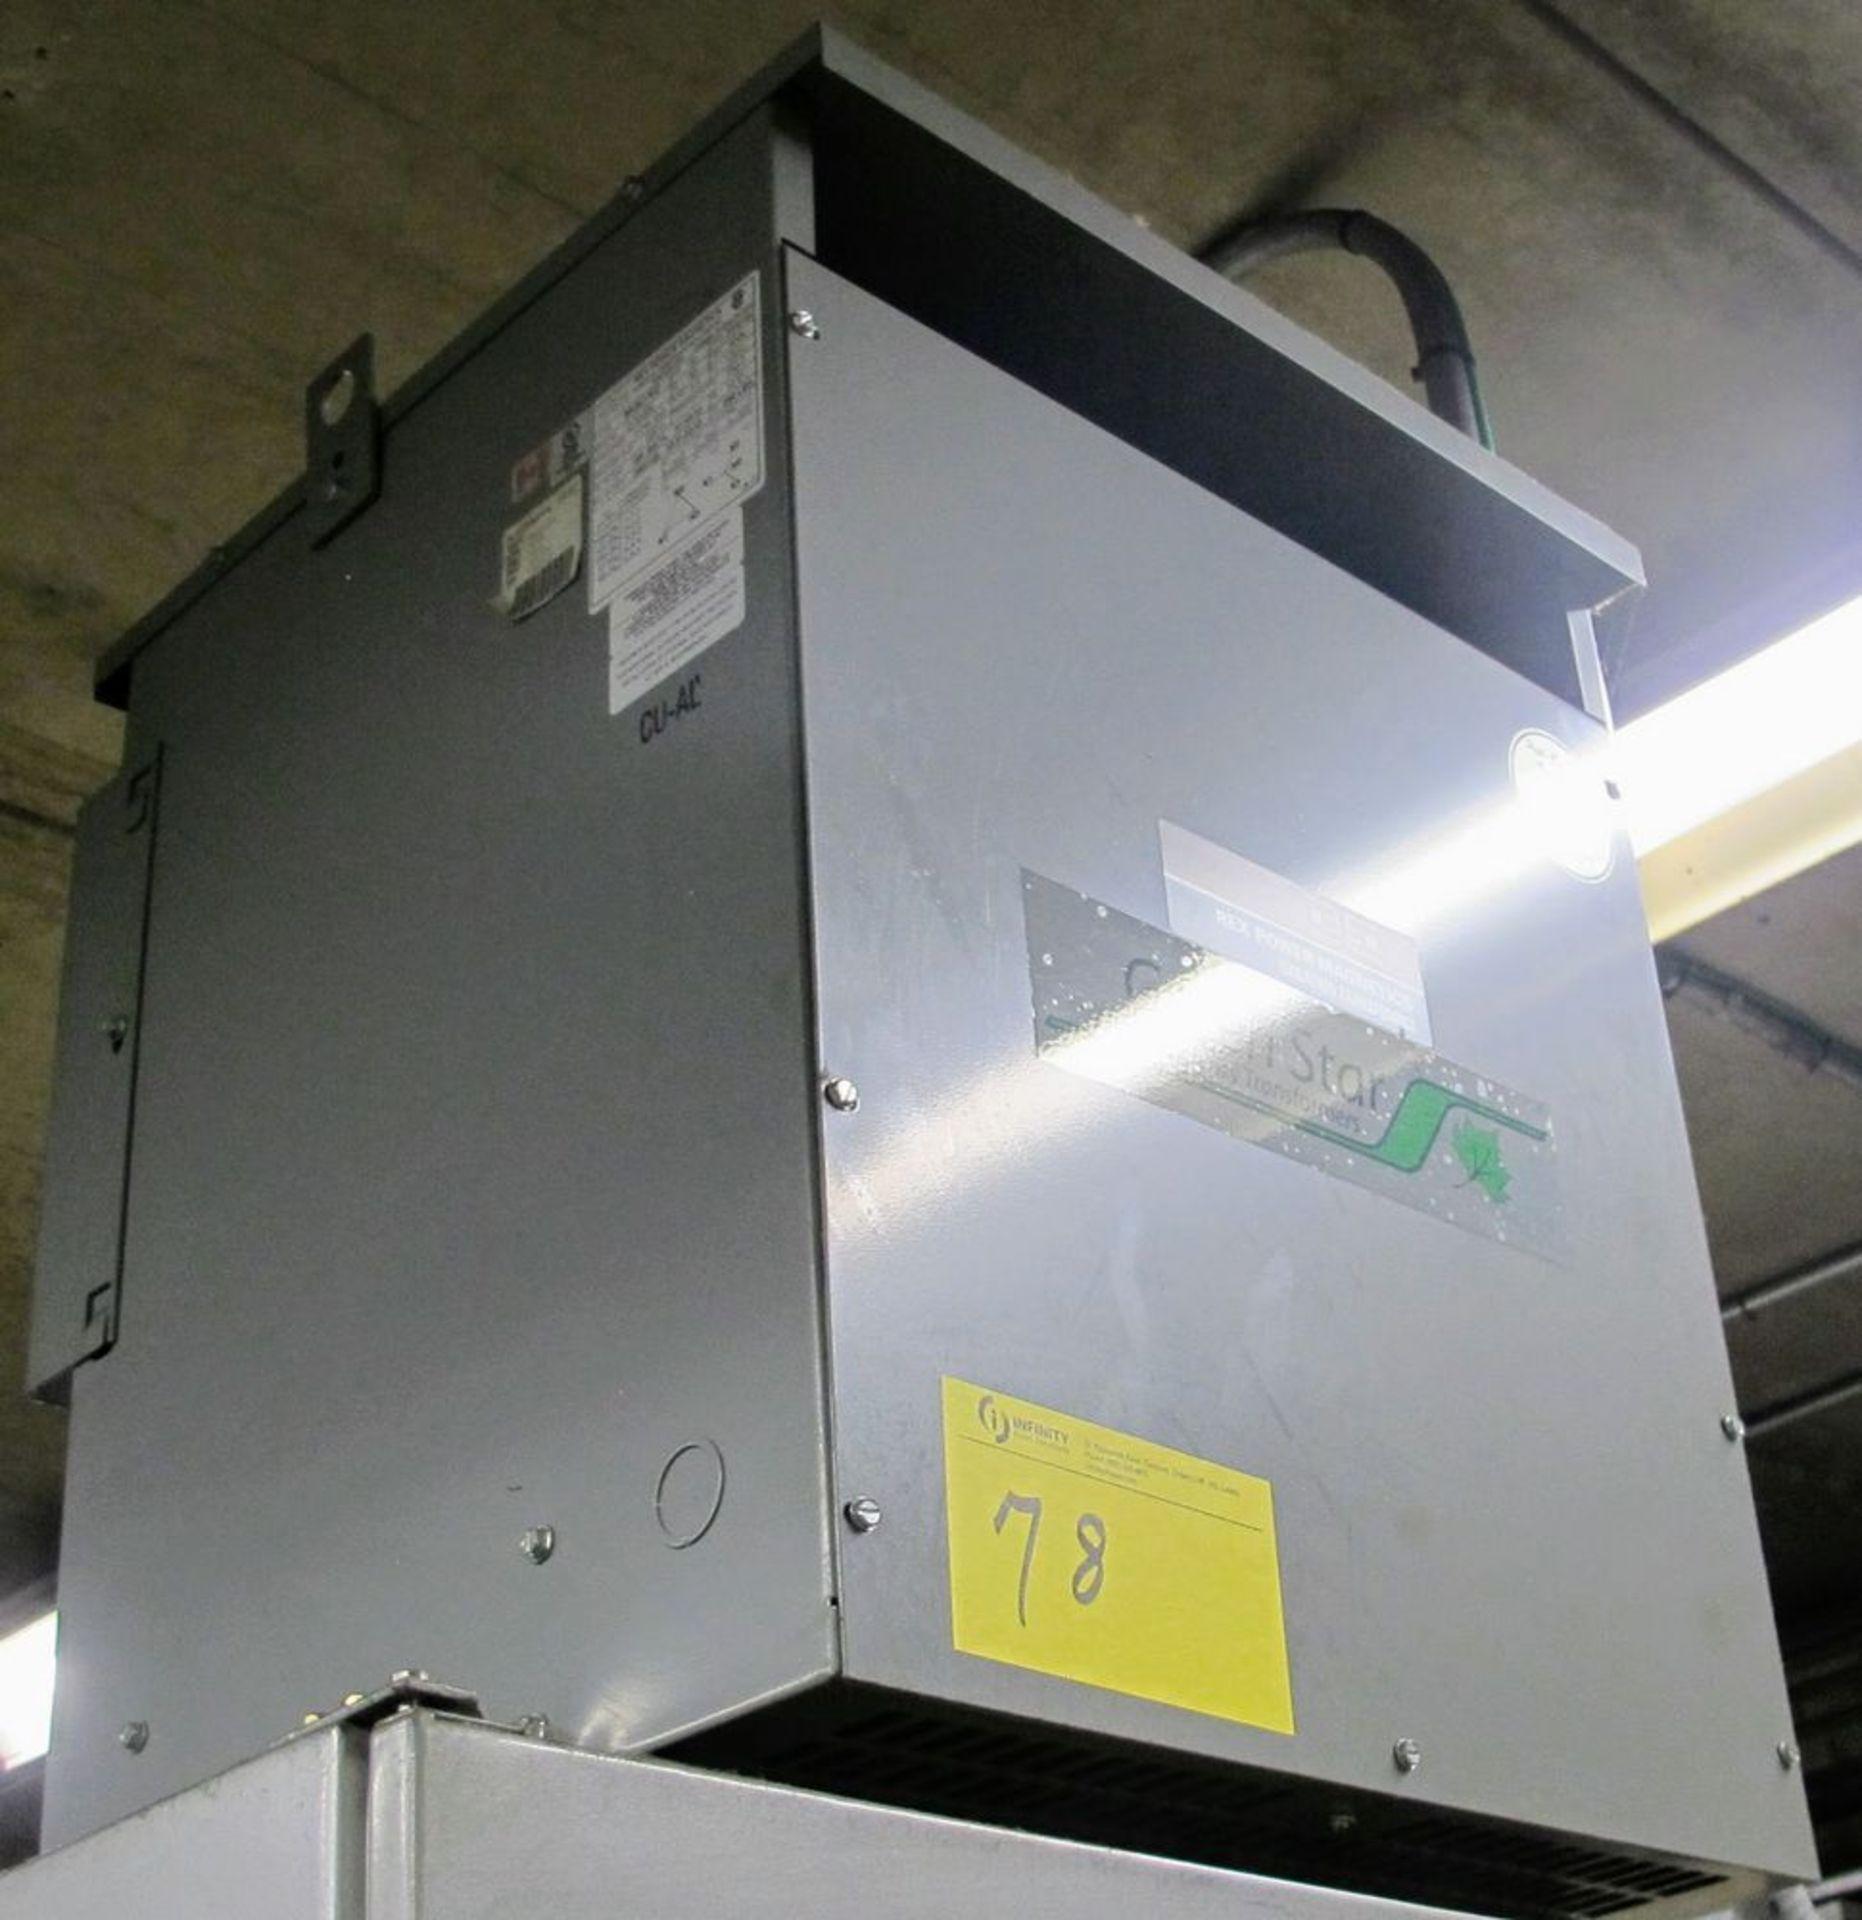 Lot 78 - REX POWER MAGNETICS TRANSFORMER, 30KVA, 600V PRIMARY, 208/120 SECONDARY